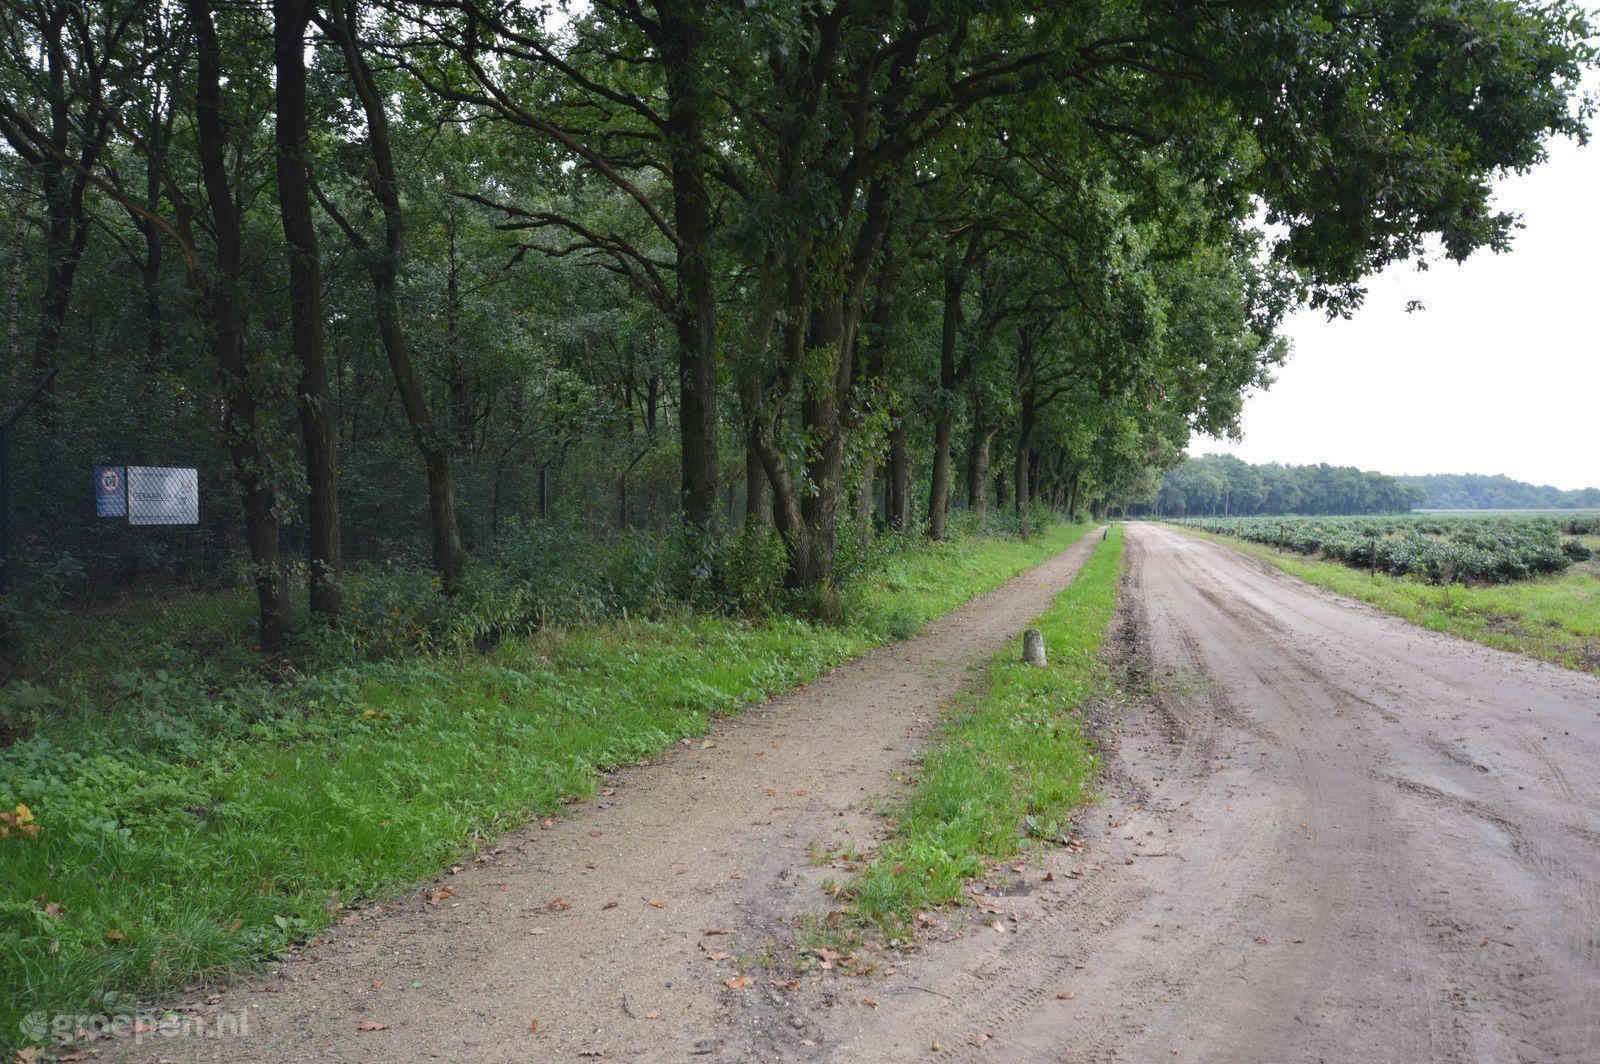 Bauernhäus Meerveld